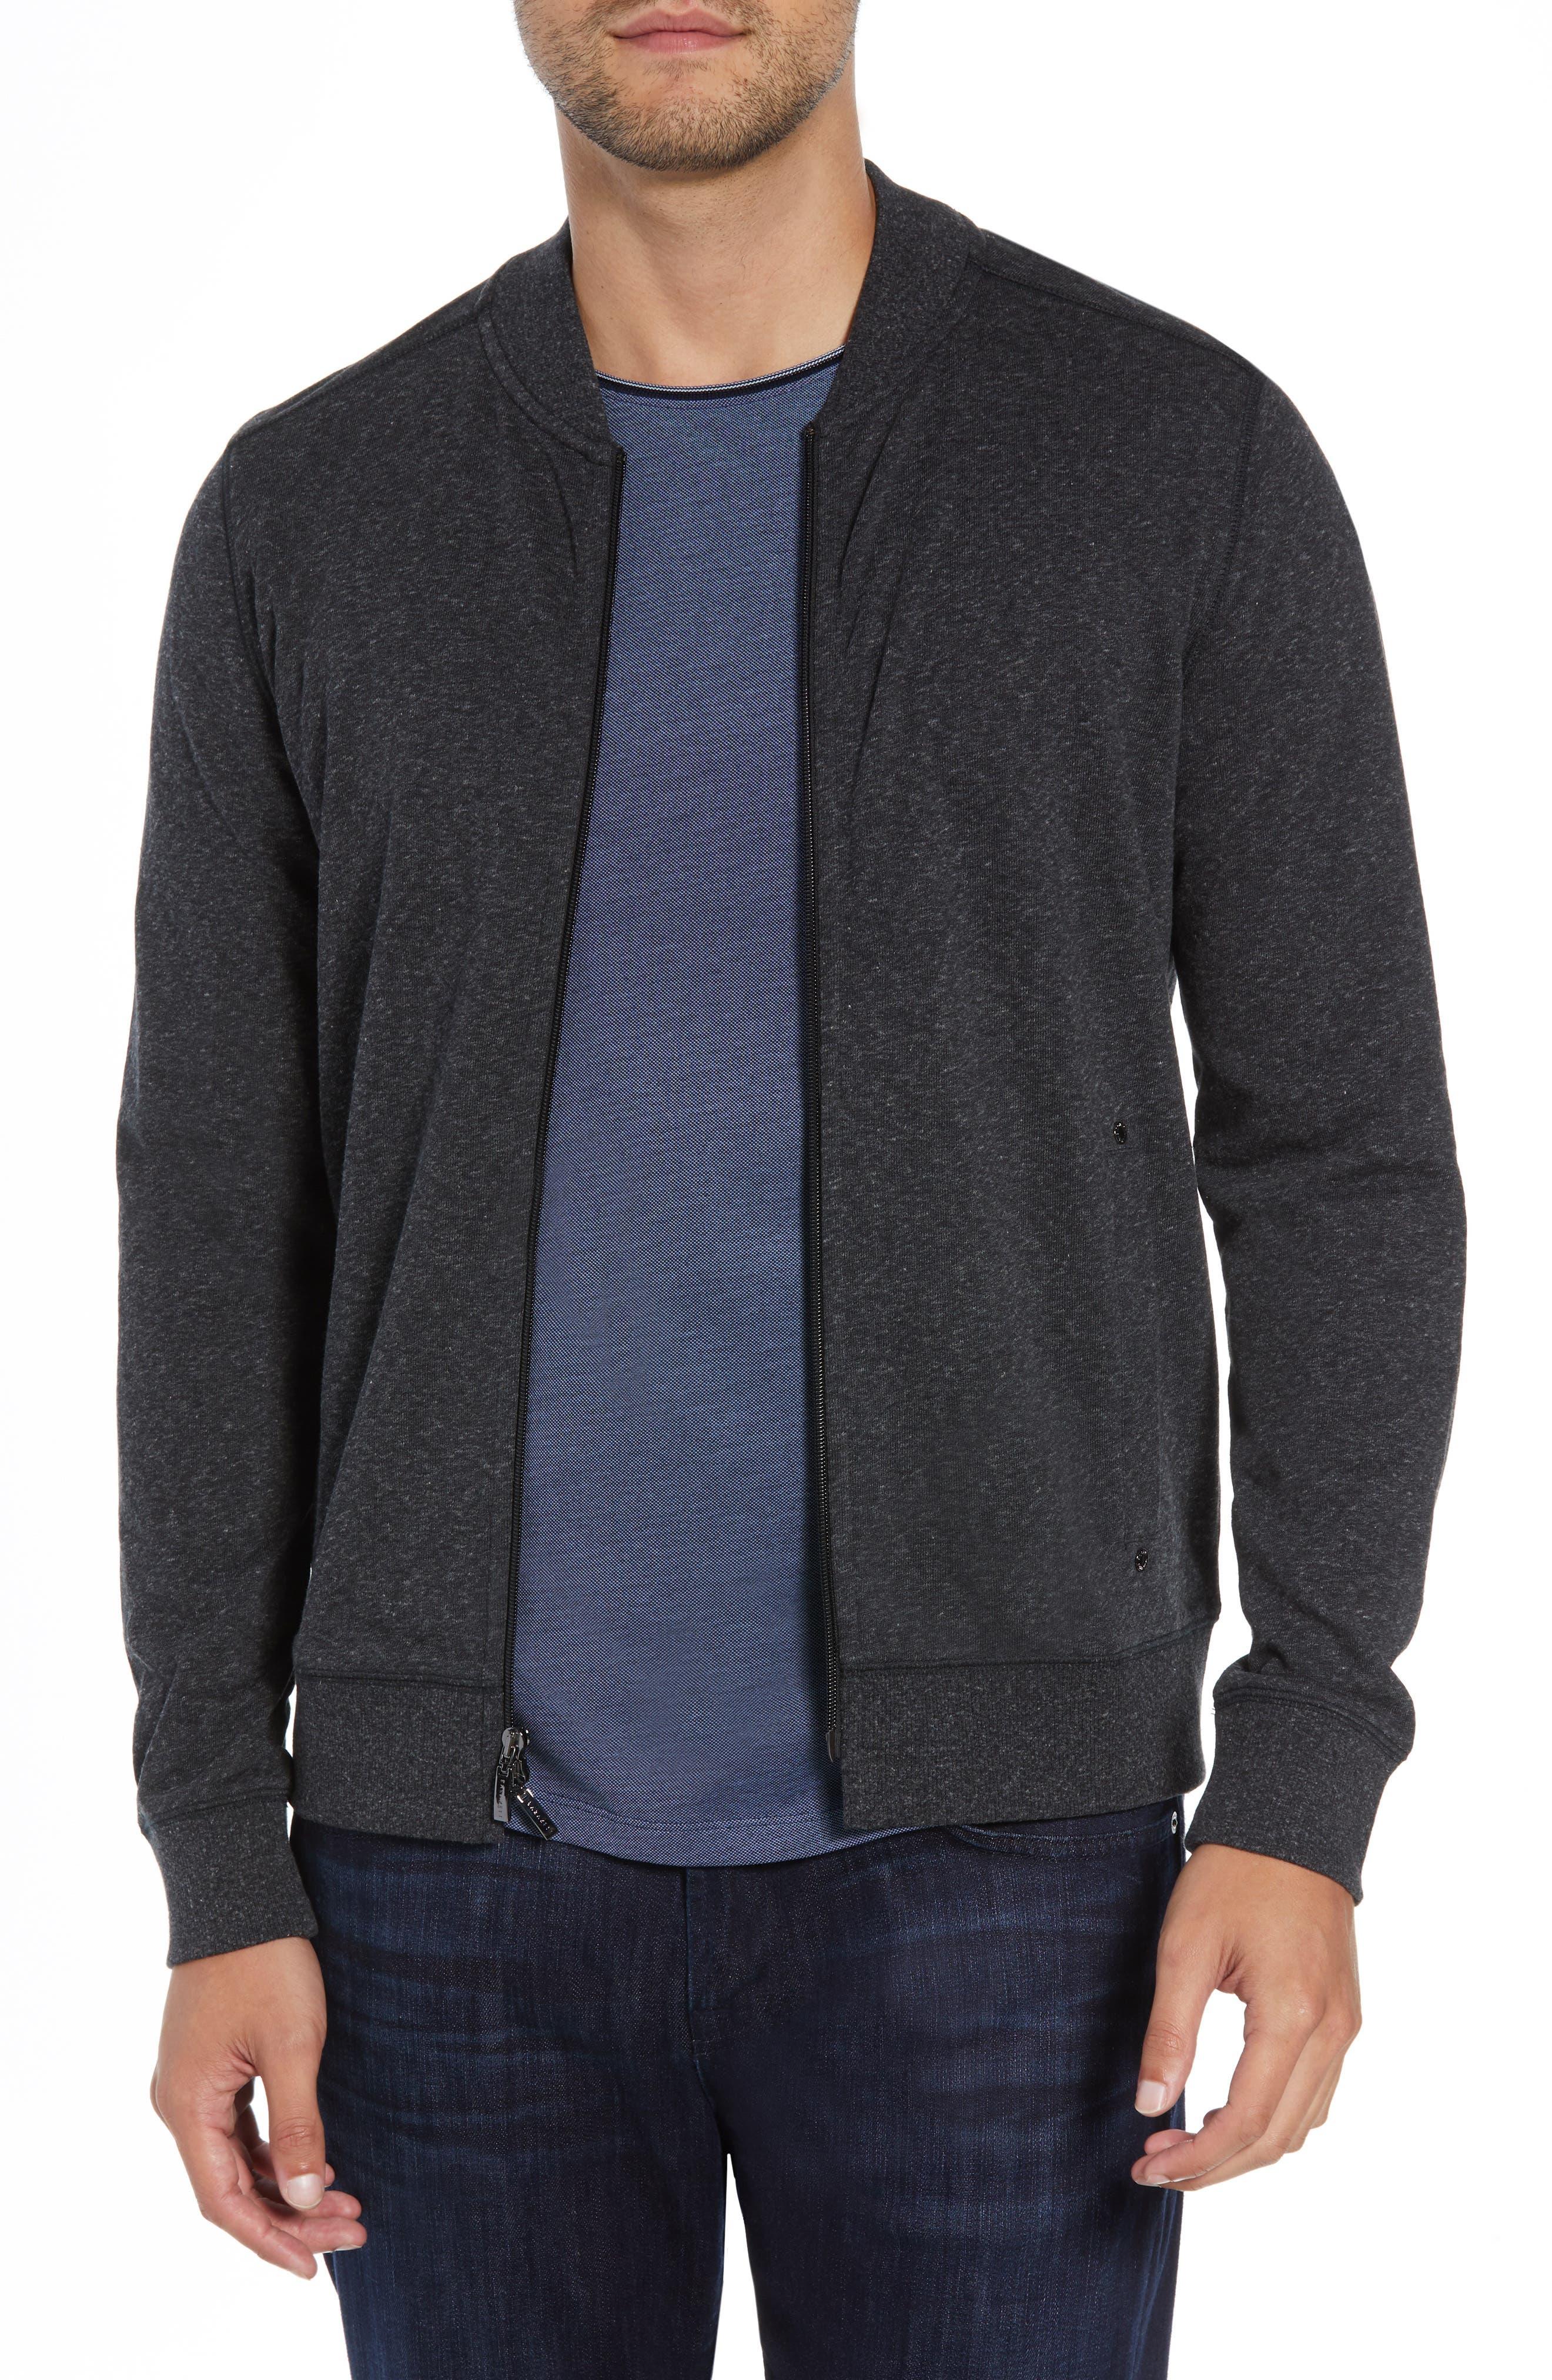 ROBERT BARAKETT Front Zip Knit Jacket, Main, color, BLACK